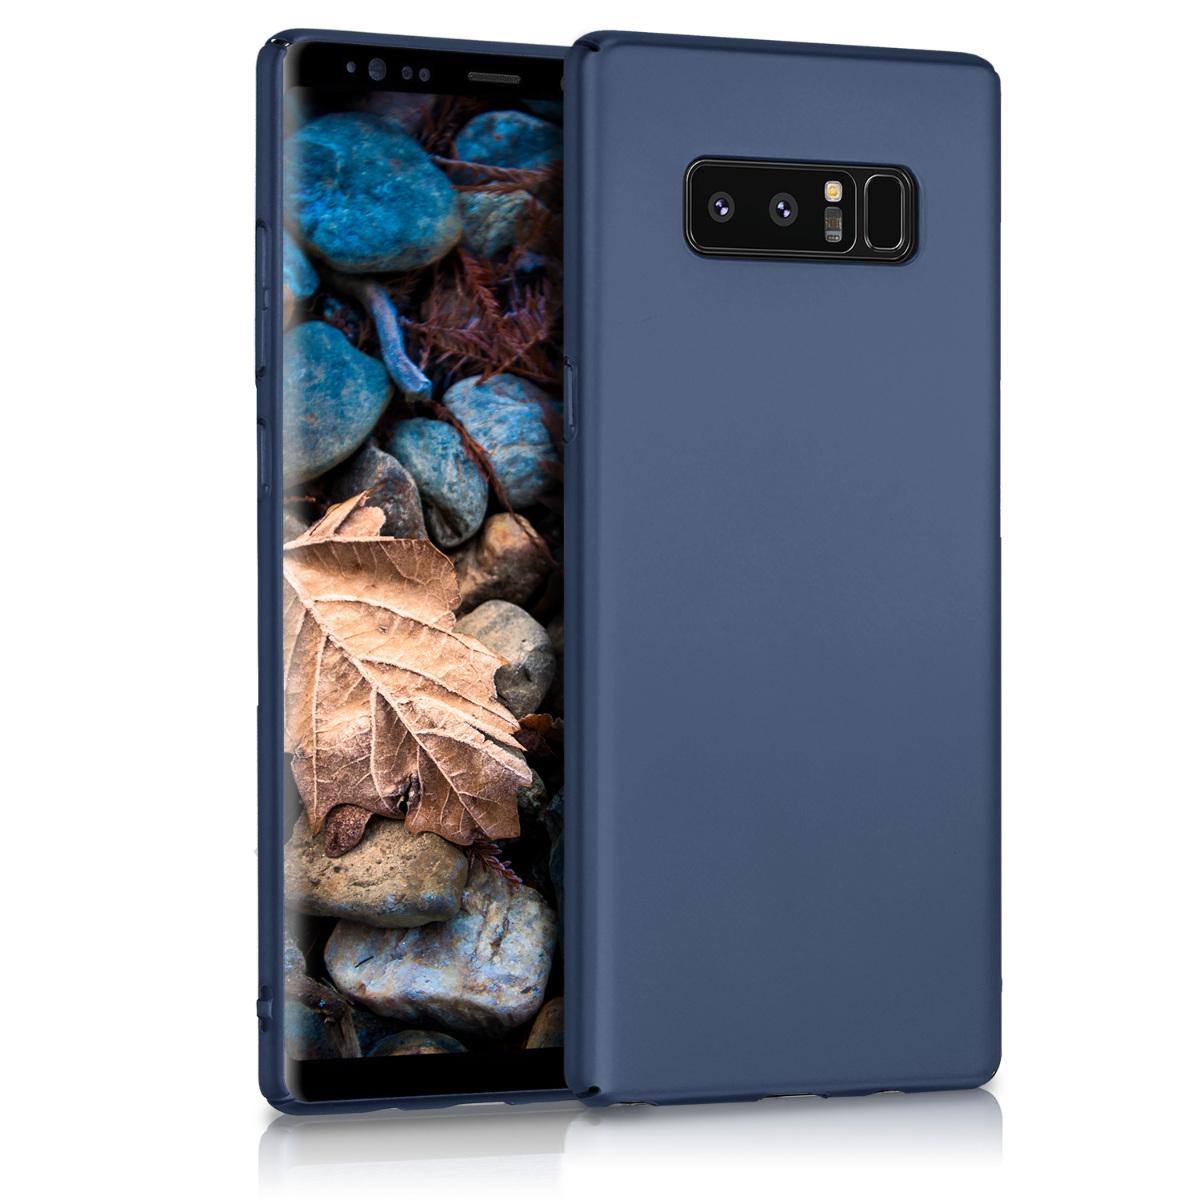 KW Slim Anti-Slip Cover - Σκληρή Θήκη Καουτσούκ Samsung Galaxy Note 8 - Μπλε μεταλλικό (43275.99)